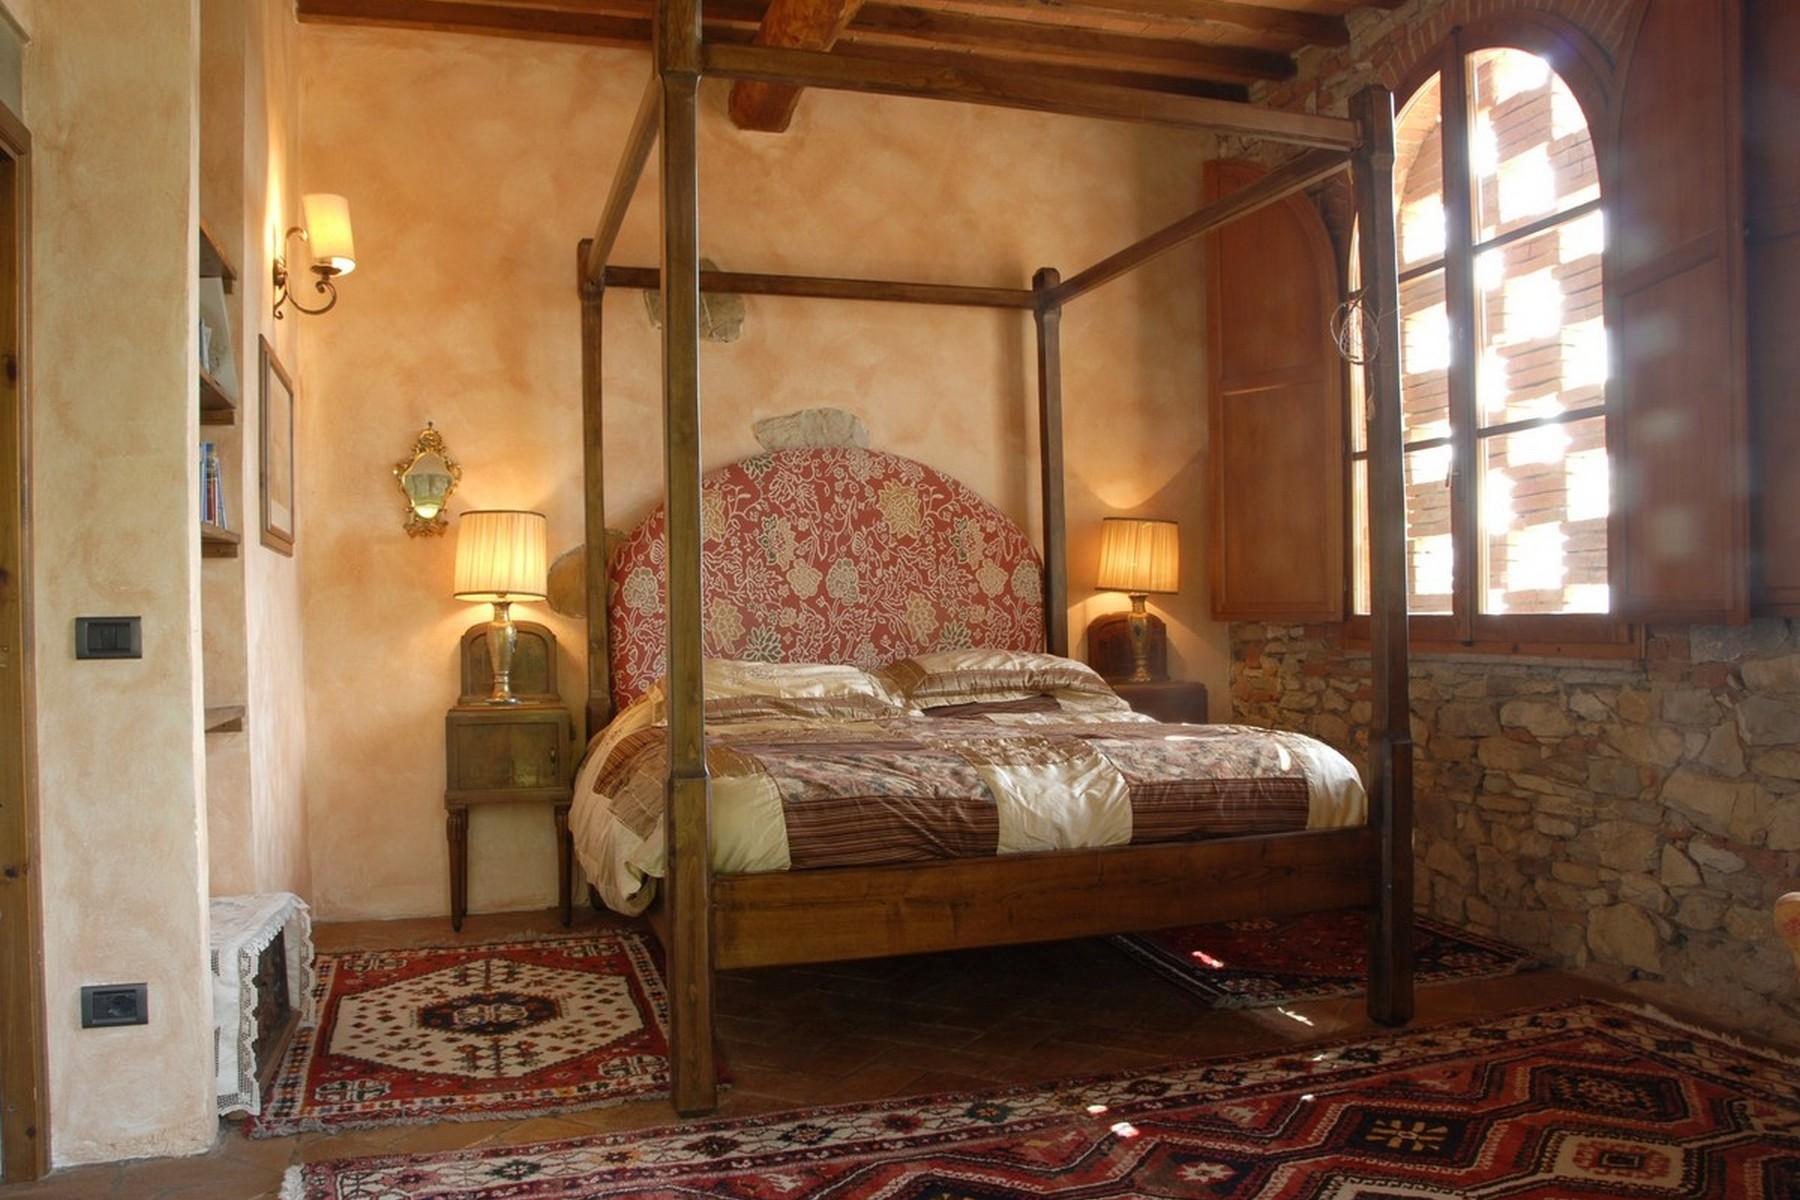 Villa in Vendita a Greve In Chianti: 5 locali, 400 mq - Foto 6